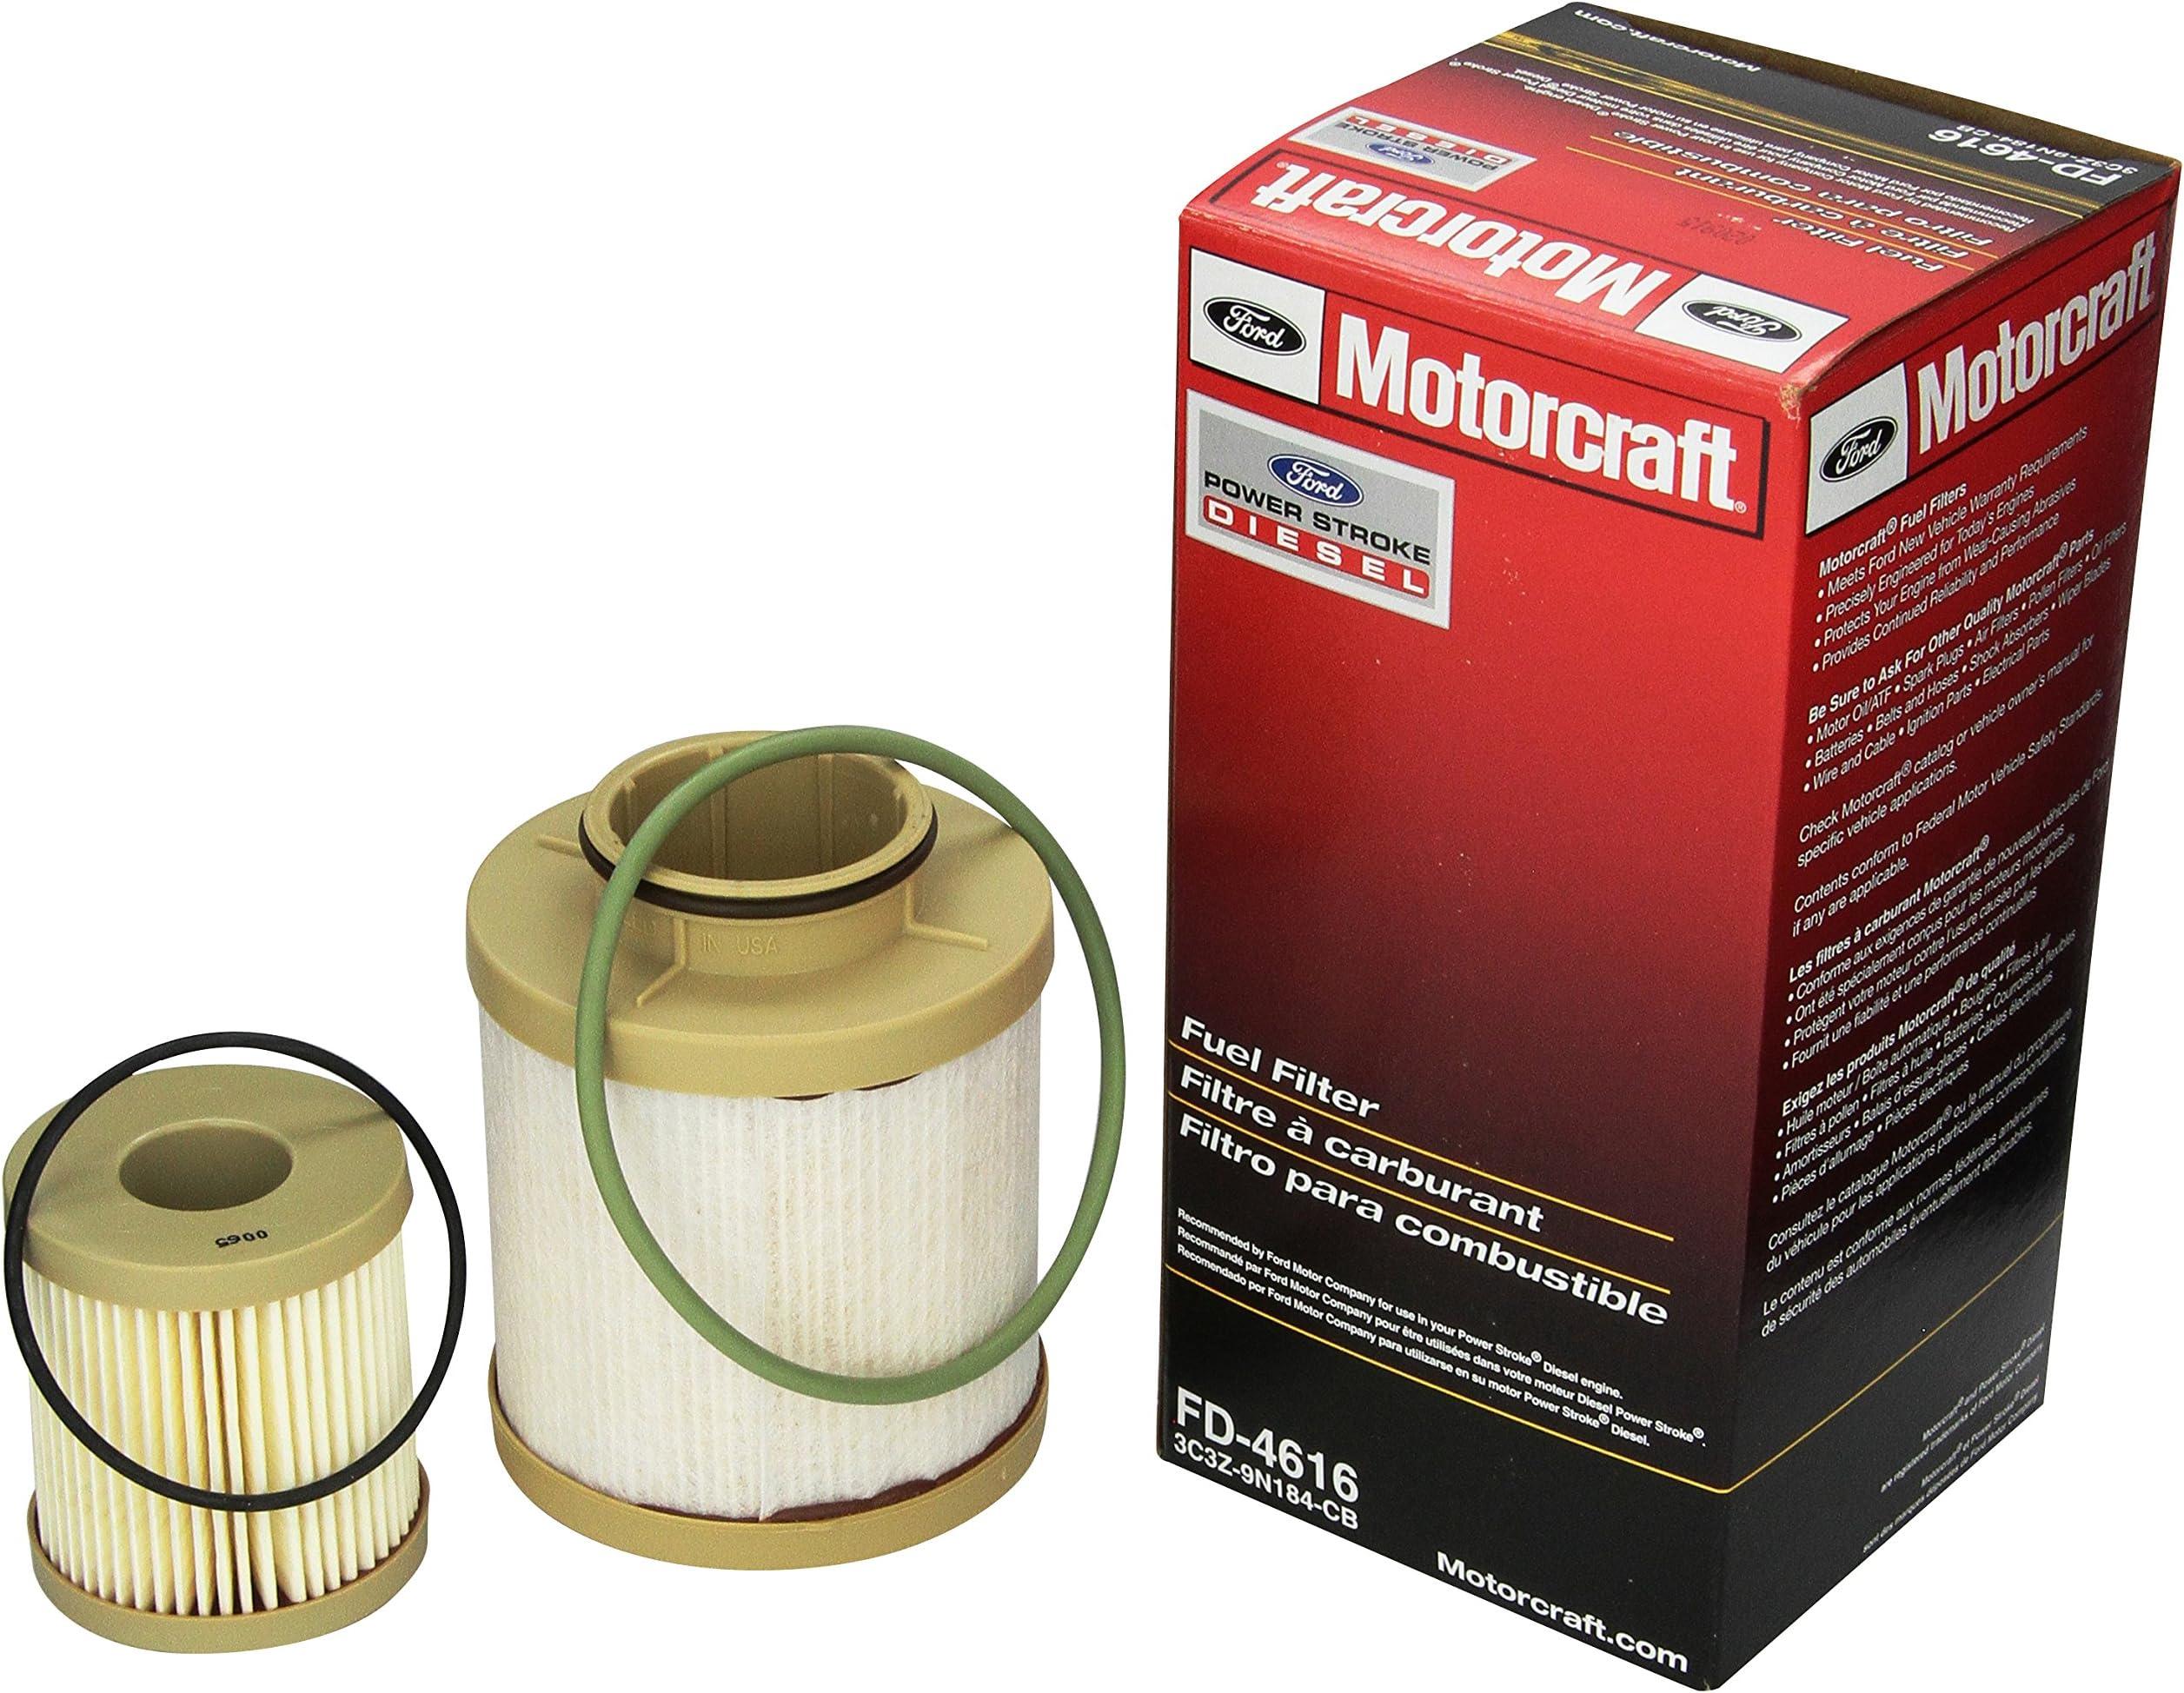 amazon com fuel filters replacement parts automotivemotorcraft fd 4616 fuel filter